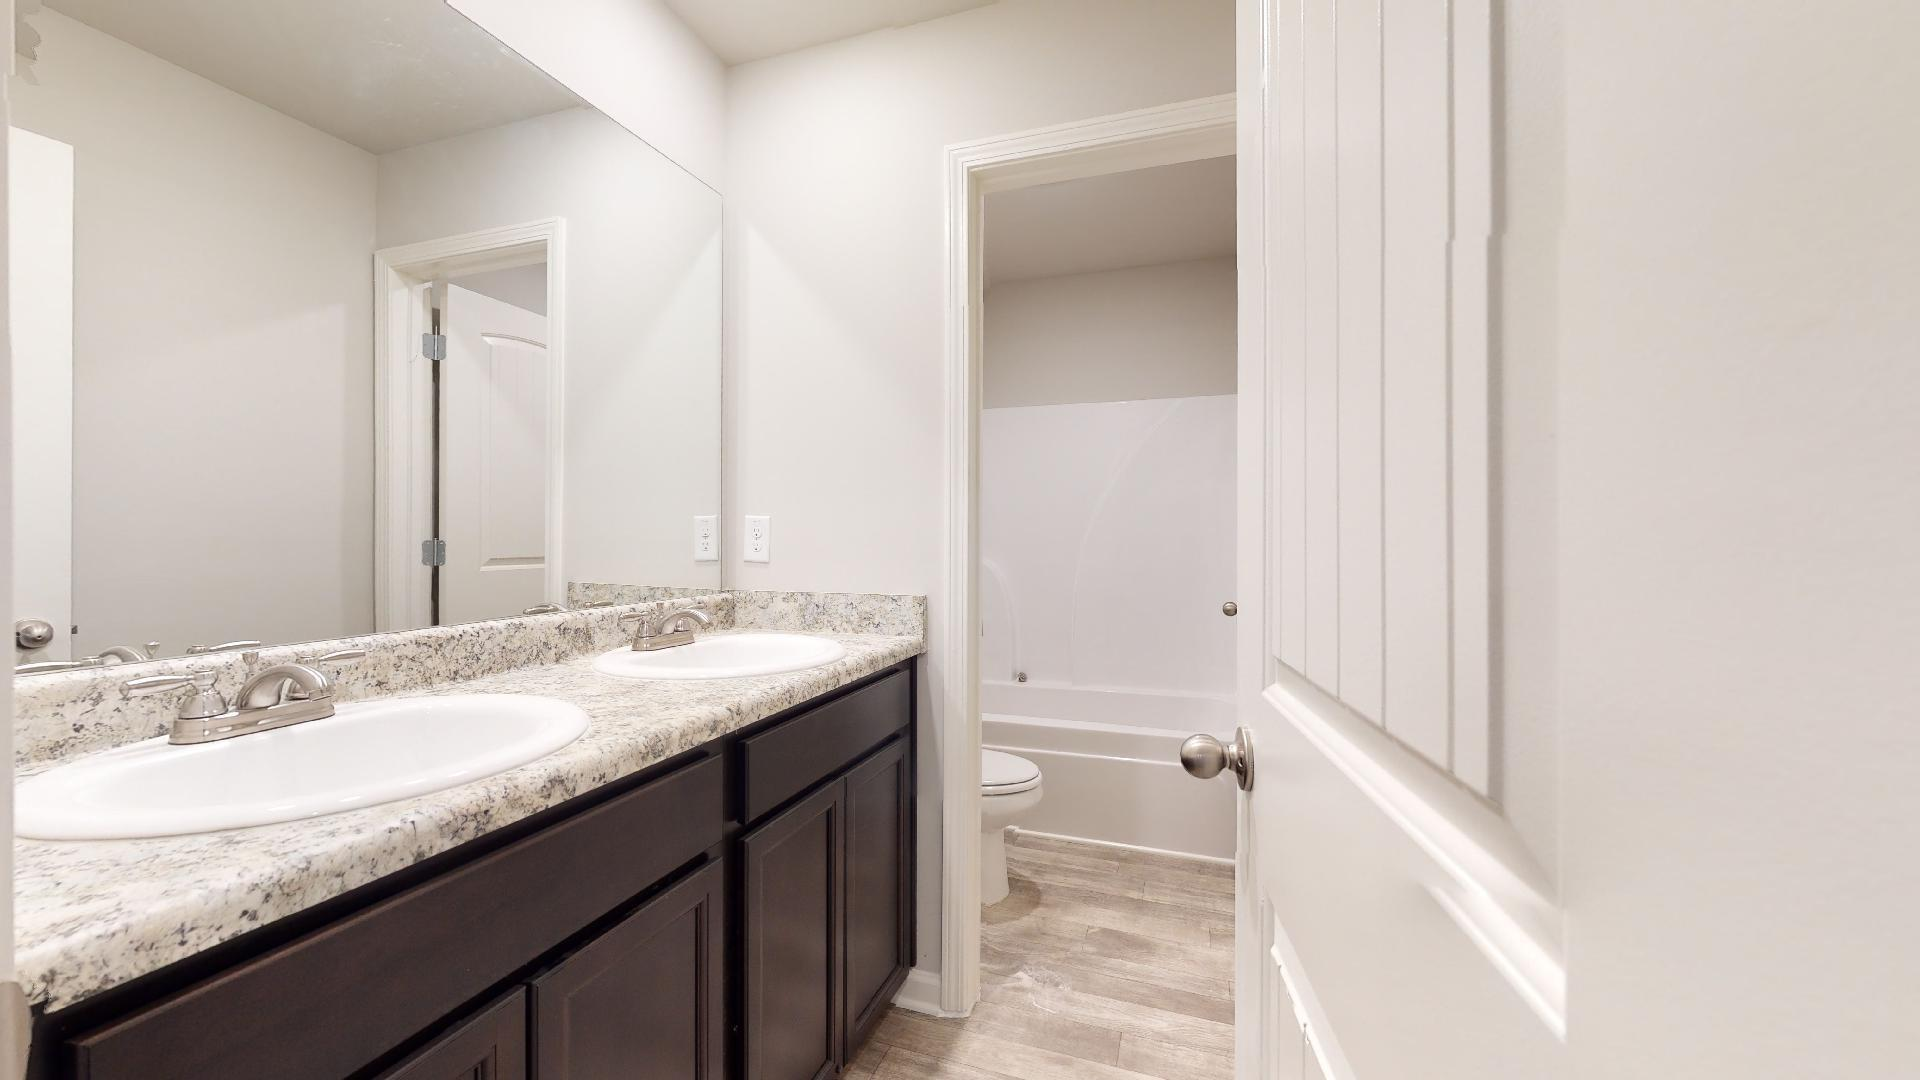 Bathroom featured in the Tucker By Liberty Communities in Atlanta, GA